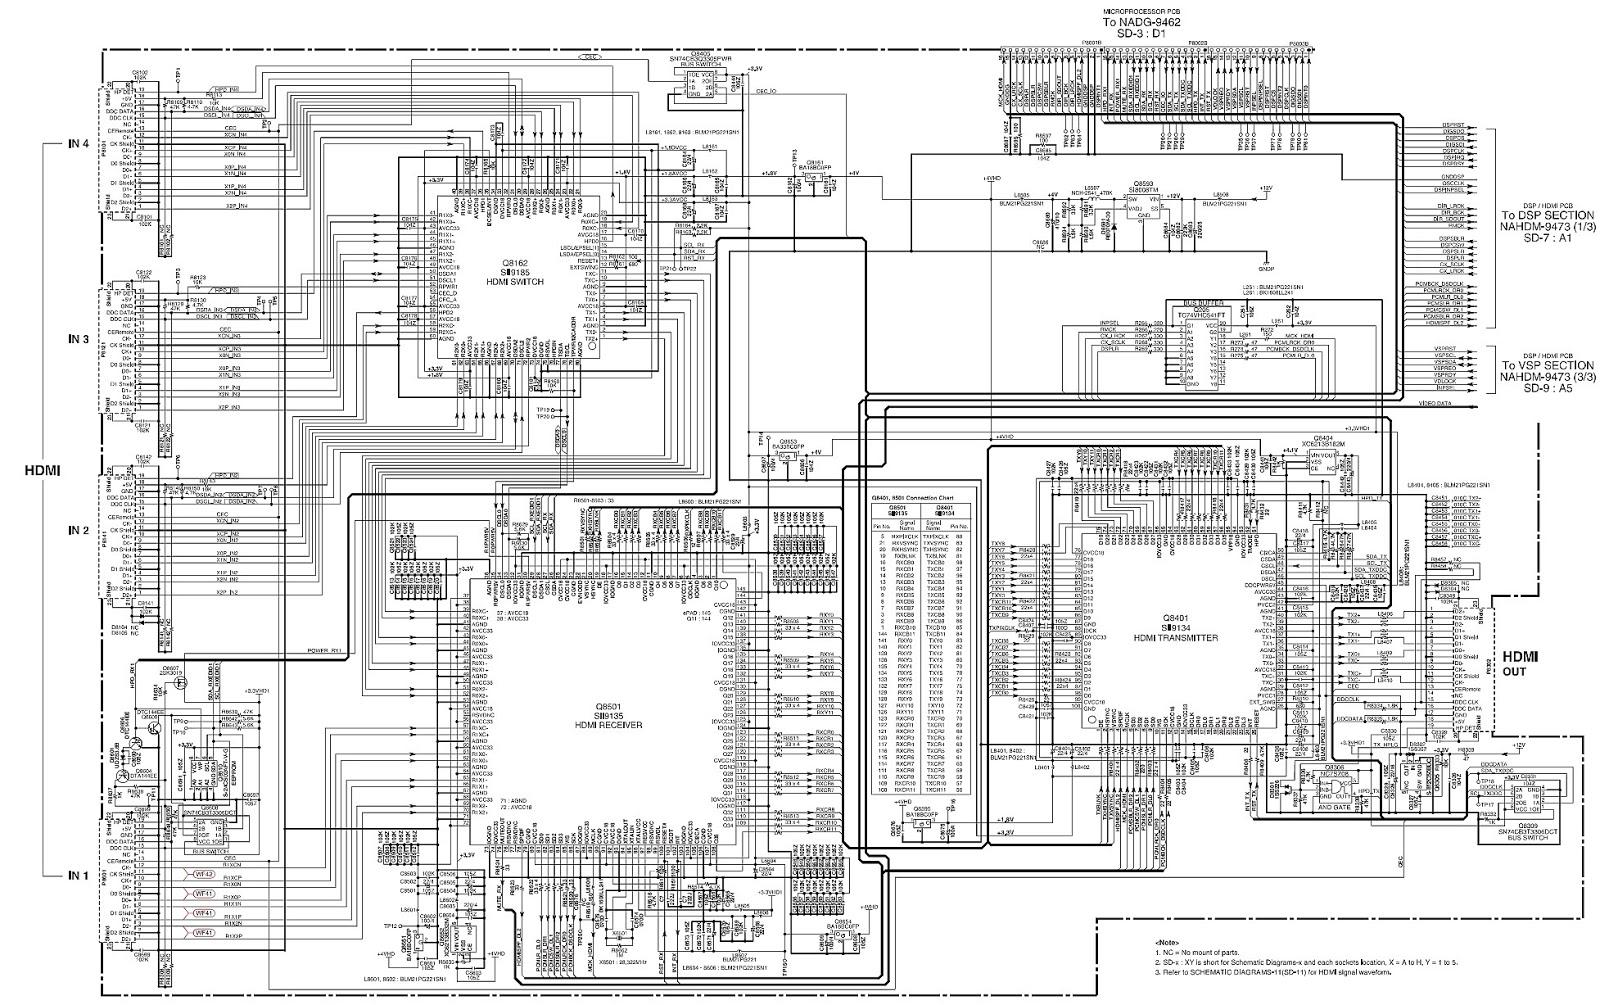 hdmi schematic wiring diagram hdmi plug wiring diagram of a hdmi circuit diagram - somurich.com #4